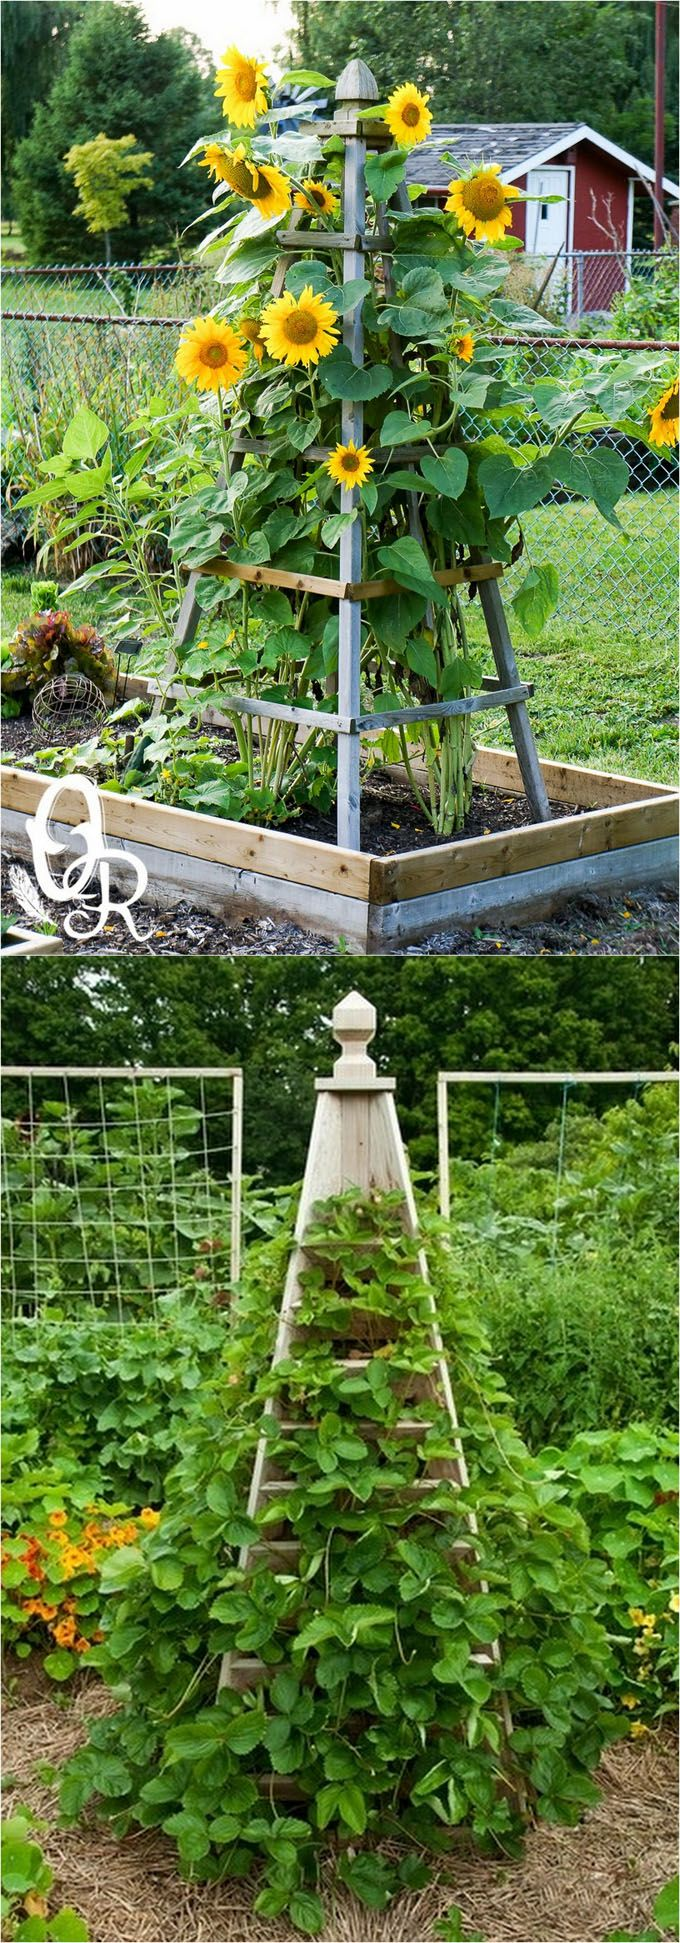 21 Easy DIY Garden Trellis Ideas & Vertical Growing Structures | Diy ...